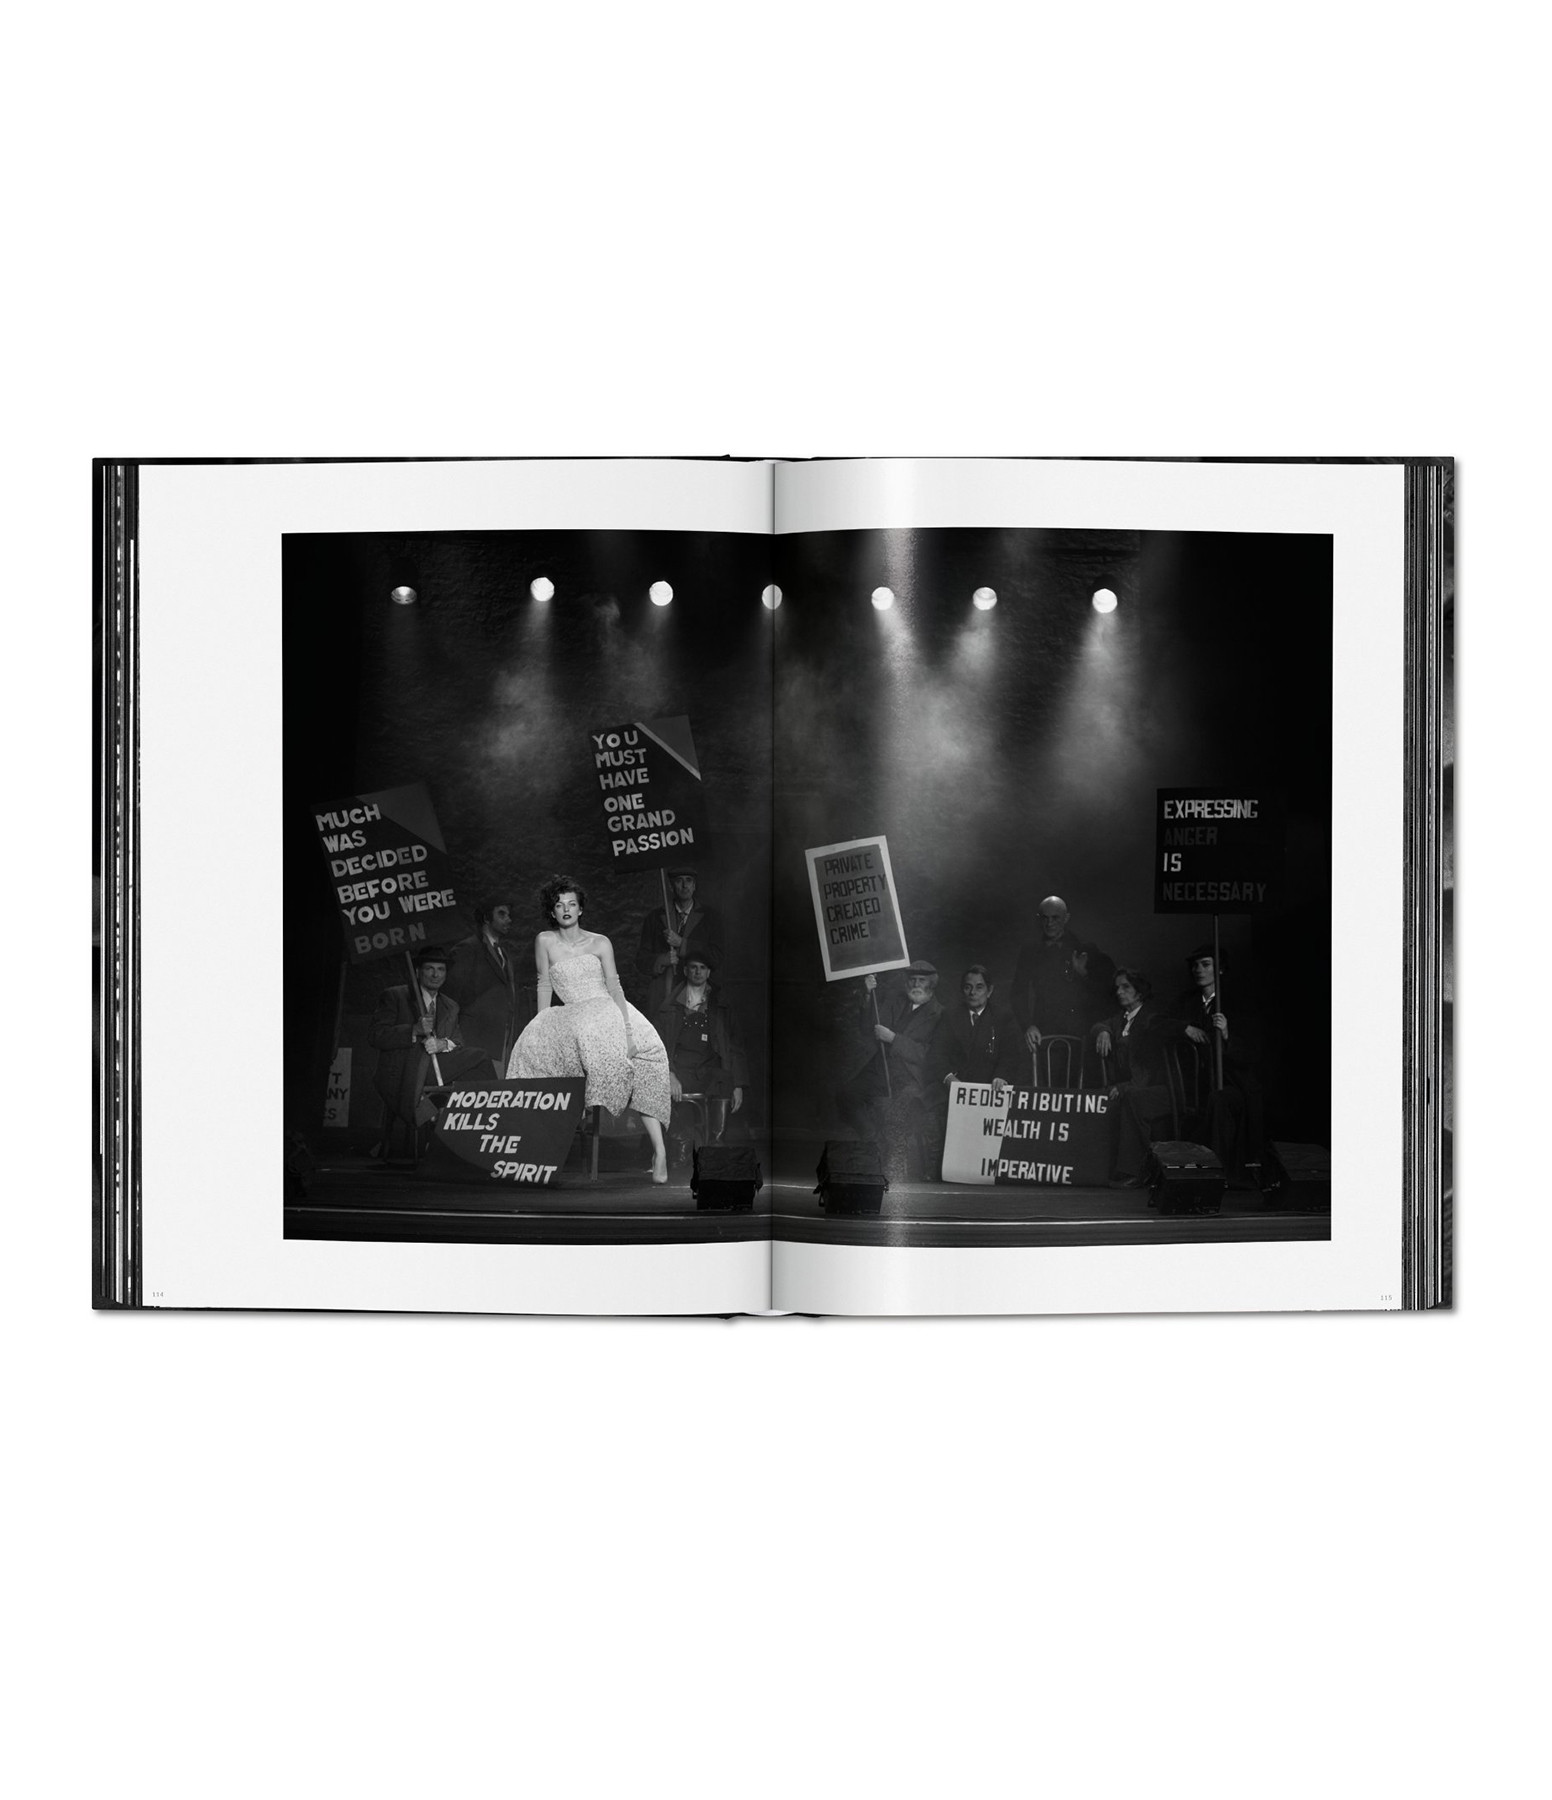 TASCHEN - Livre Peter Lindbergh, Untold Stories